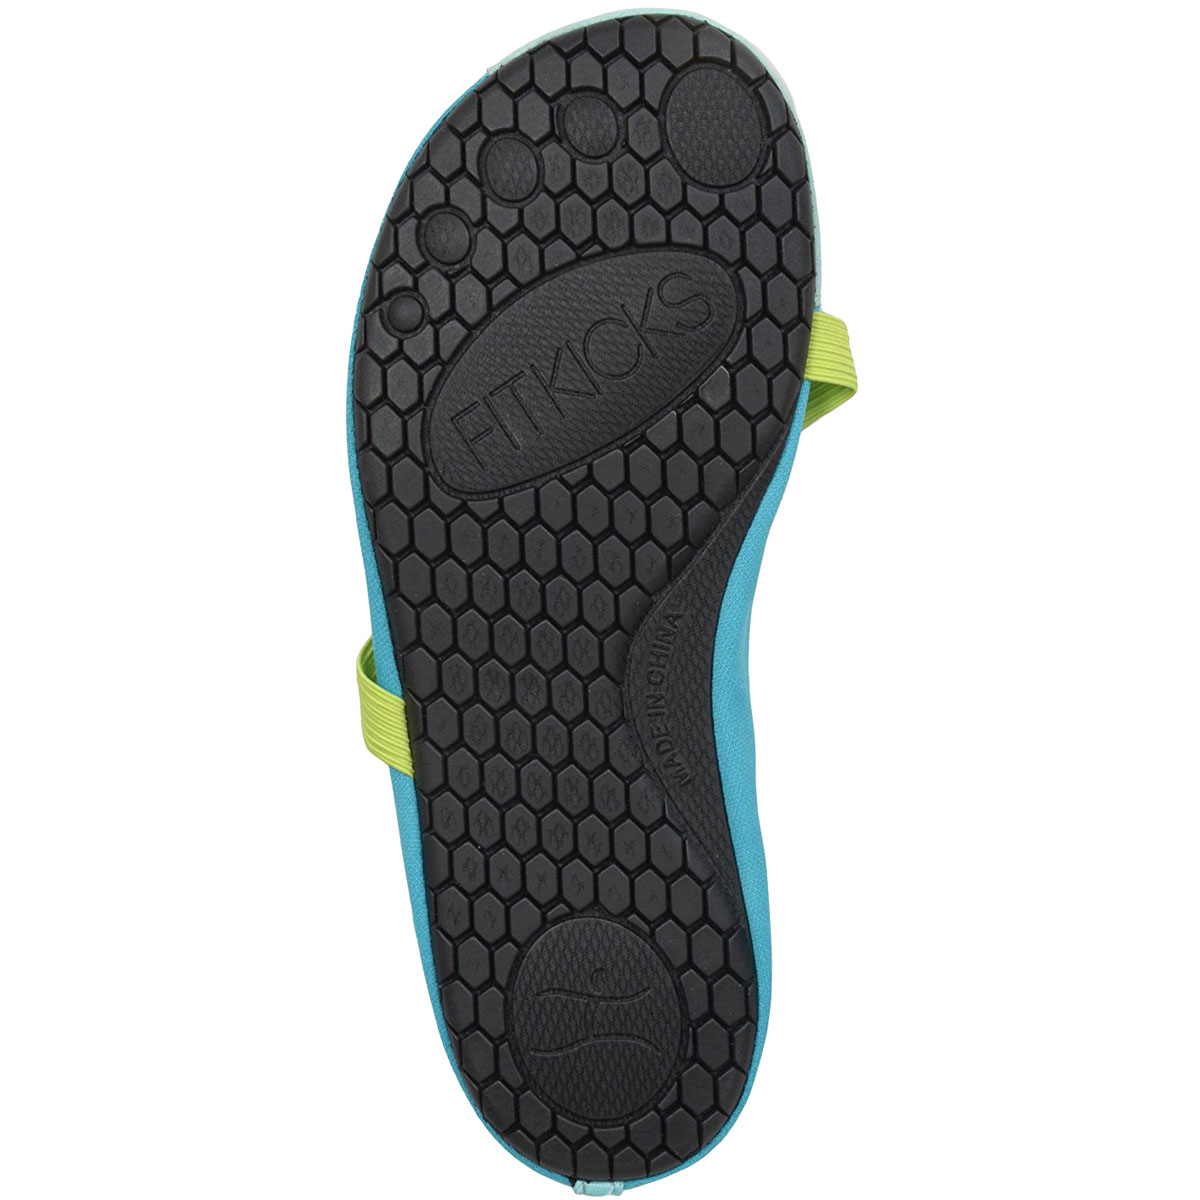 FitKicks-Women-039-s-Non-Slip-Sole-Active-Footwear thumbnail 39